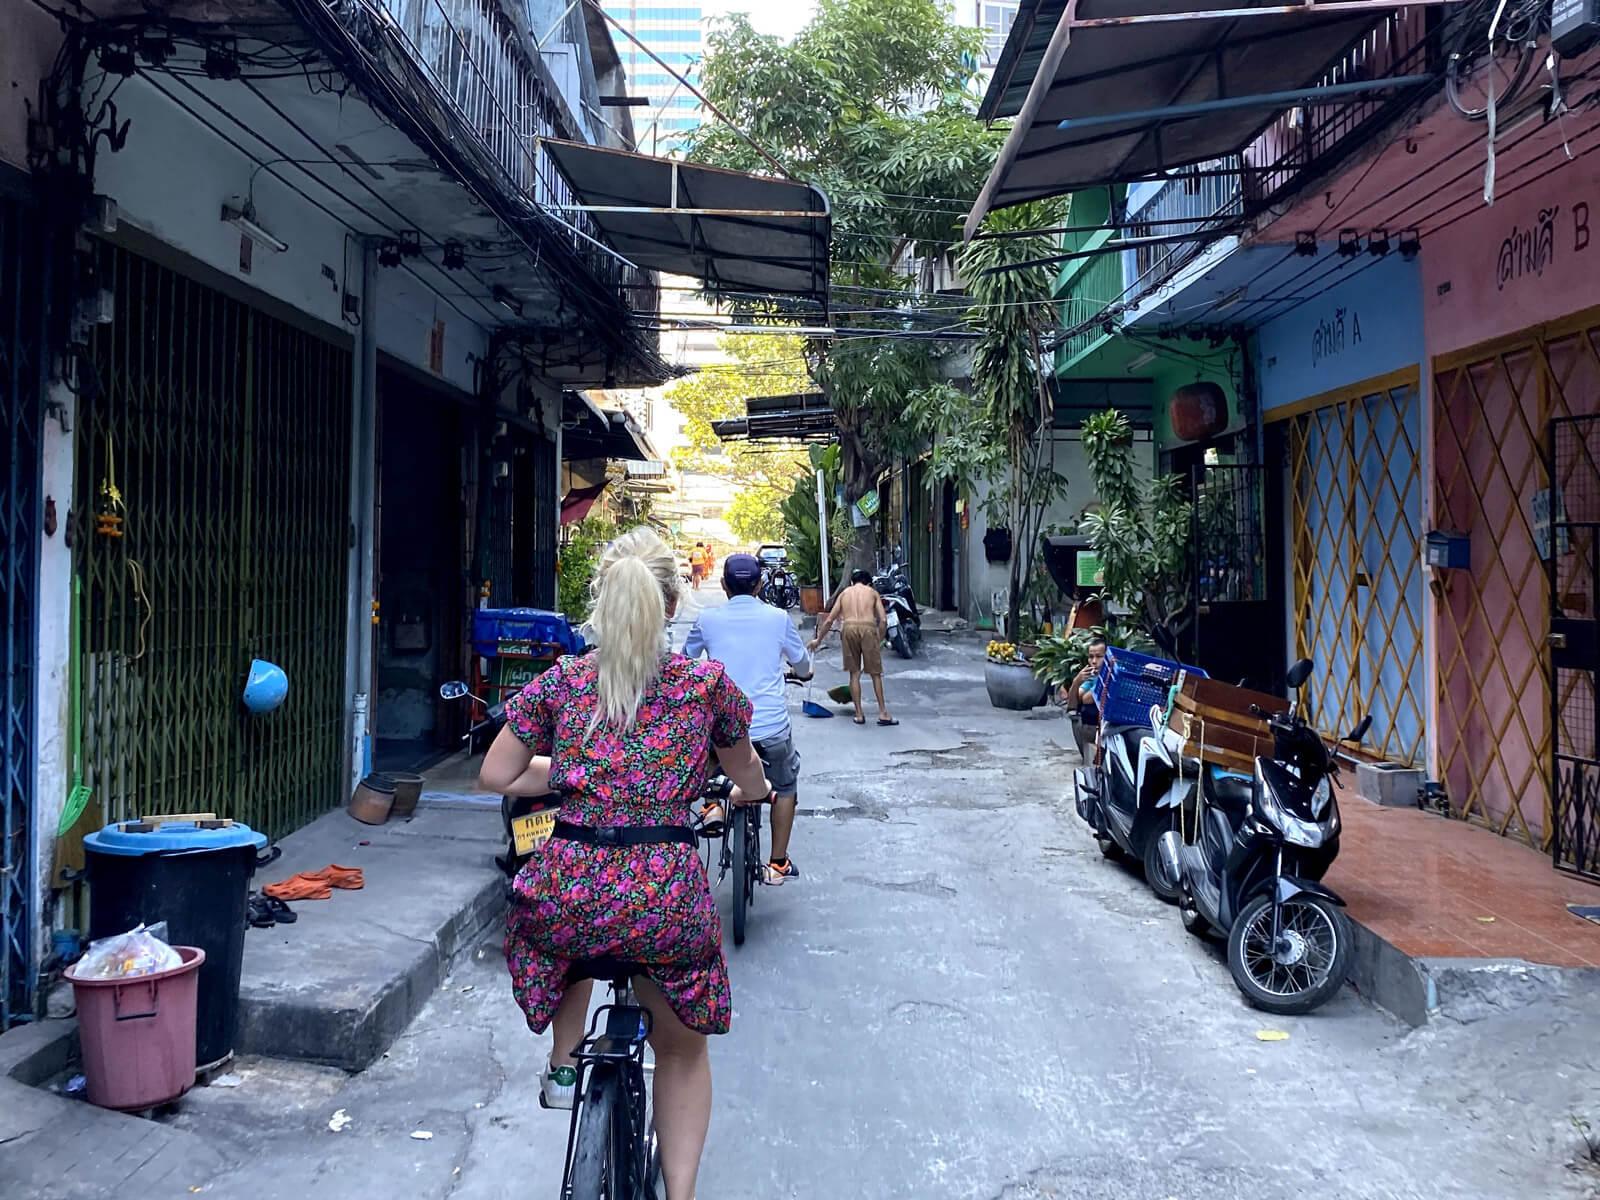 rondreis thailand bangkok blog 2